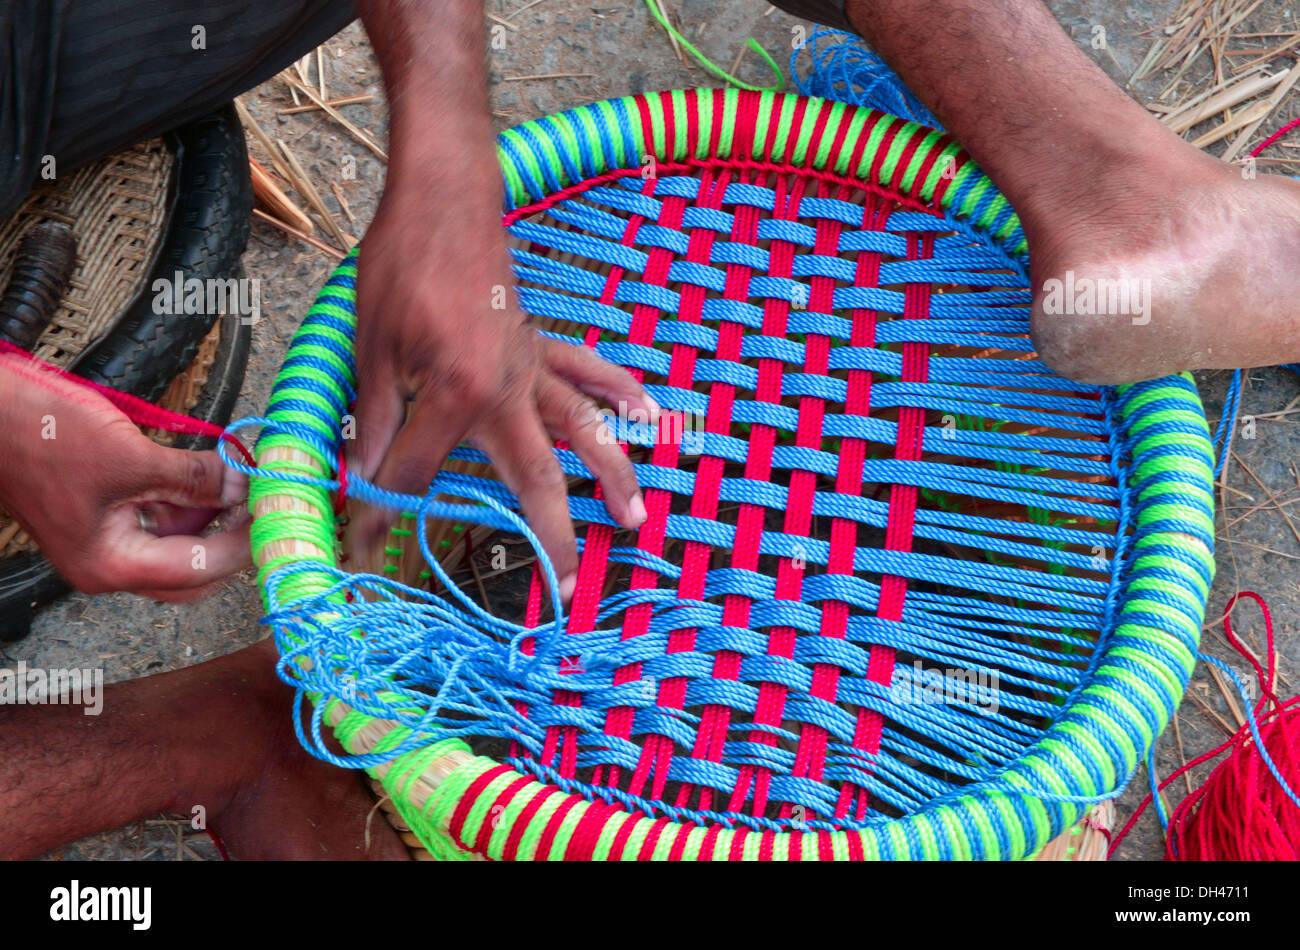 Tabouret En Plastique Mudha Tissage Homme Assis Pour Ajmer Rajasthan